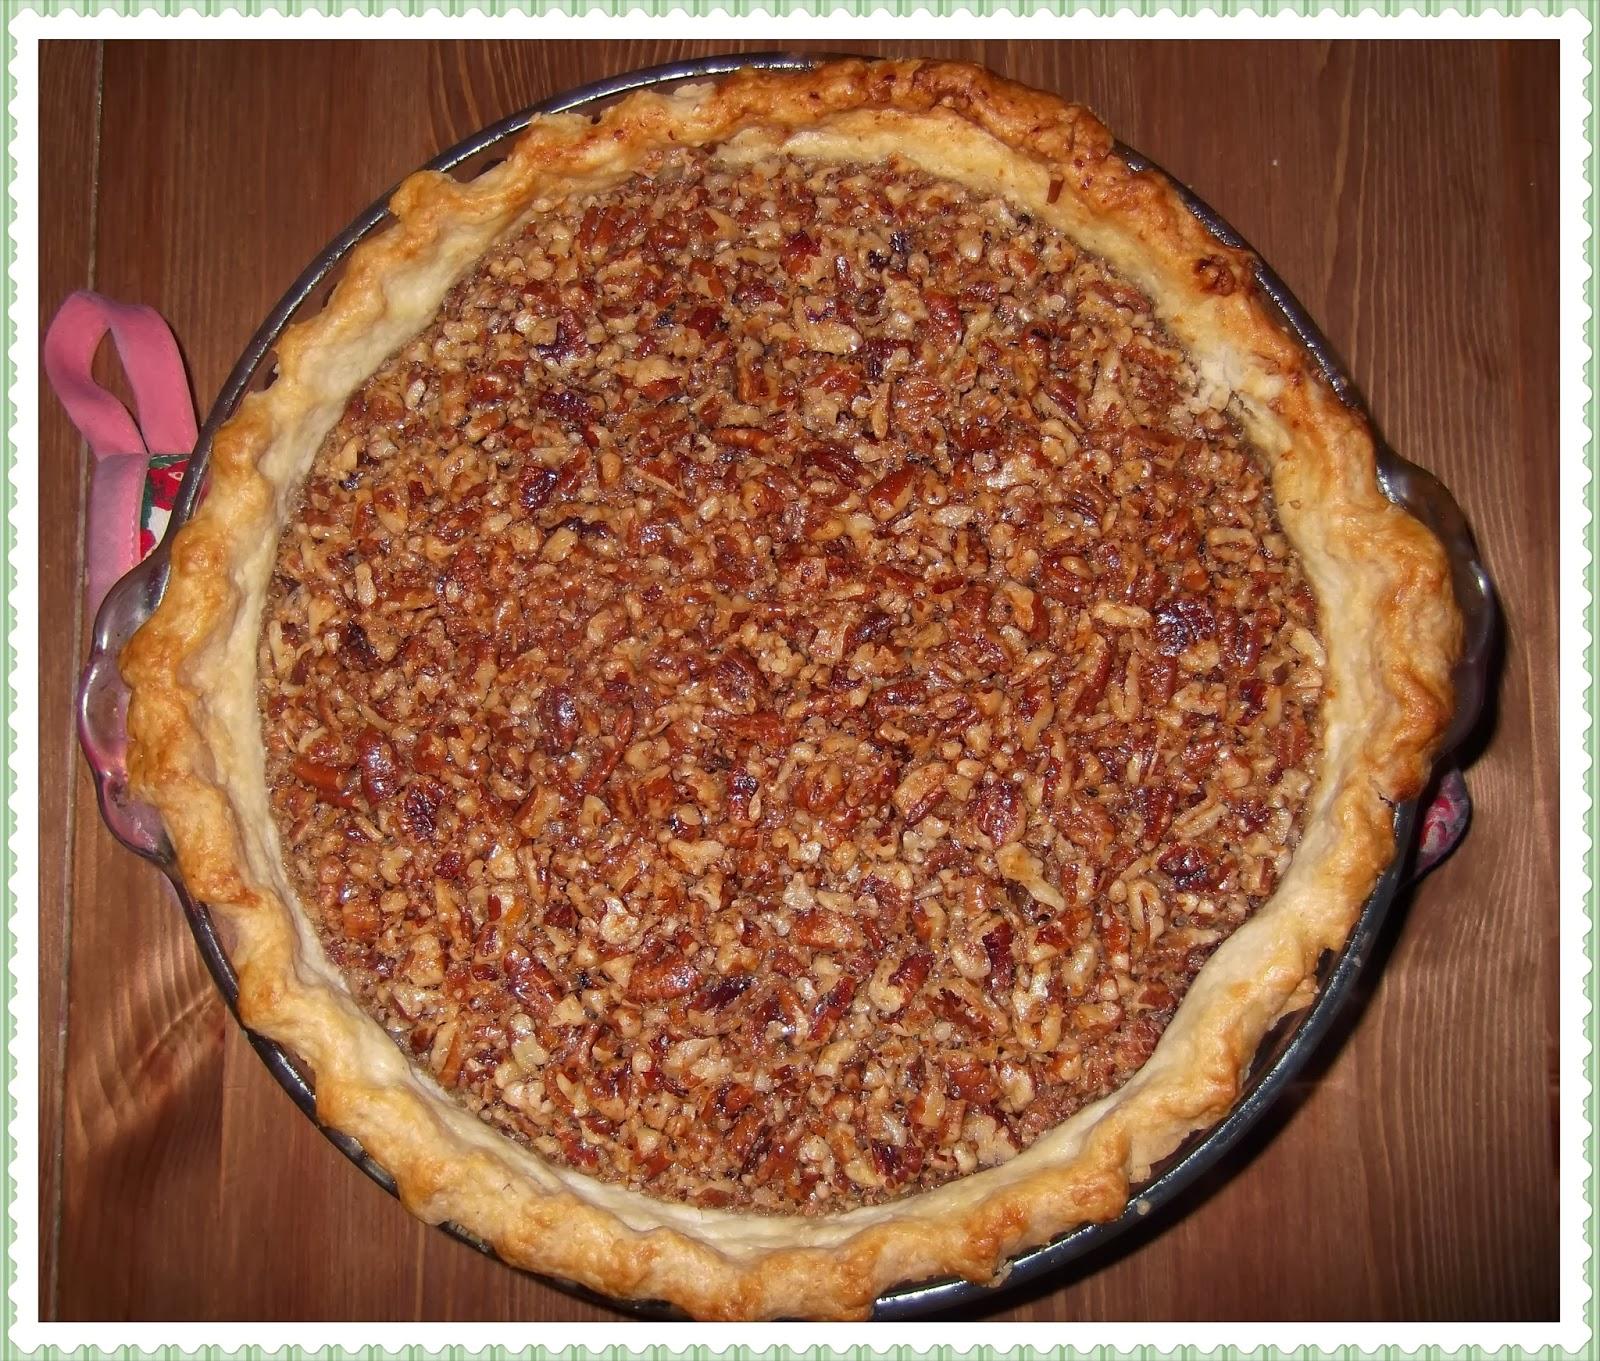 Rosie's Country Baking: Maple Pecan Pie